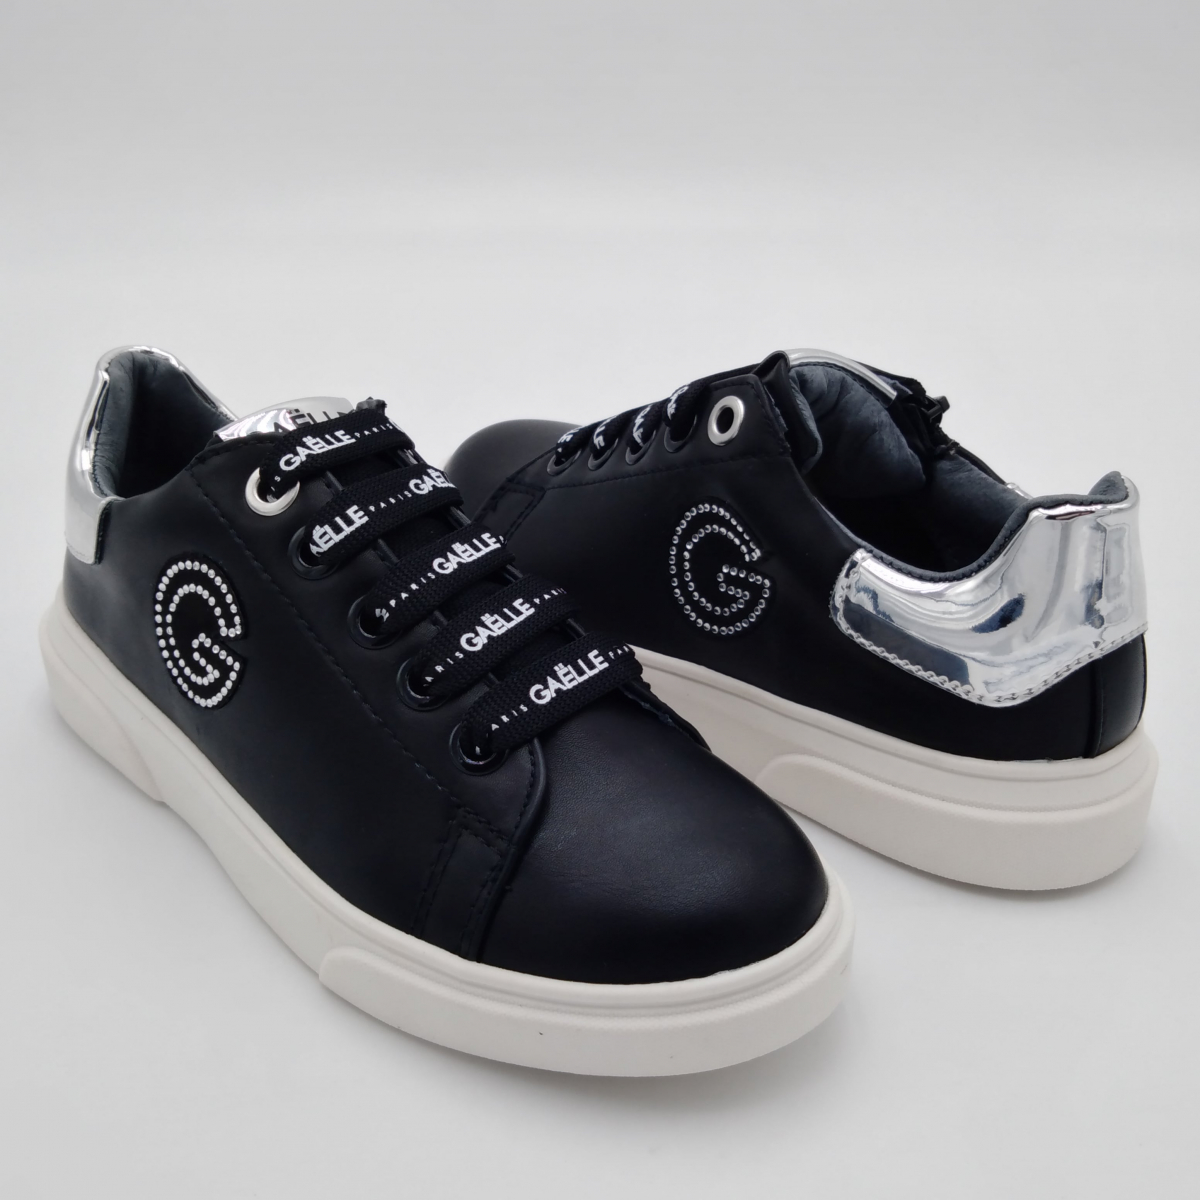 Gaelle Paris -Sneaker lacci...